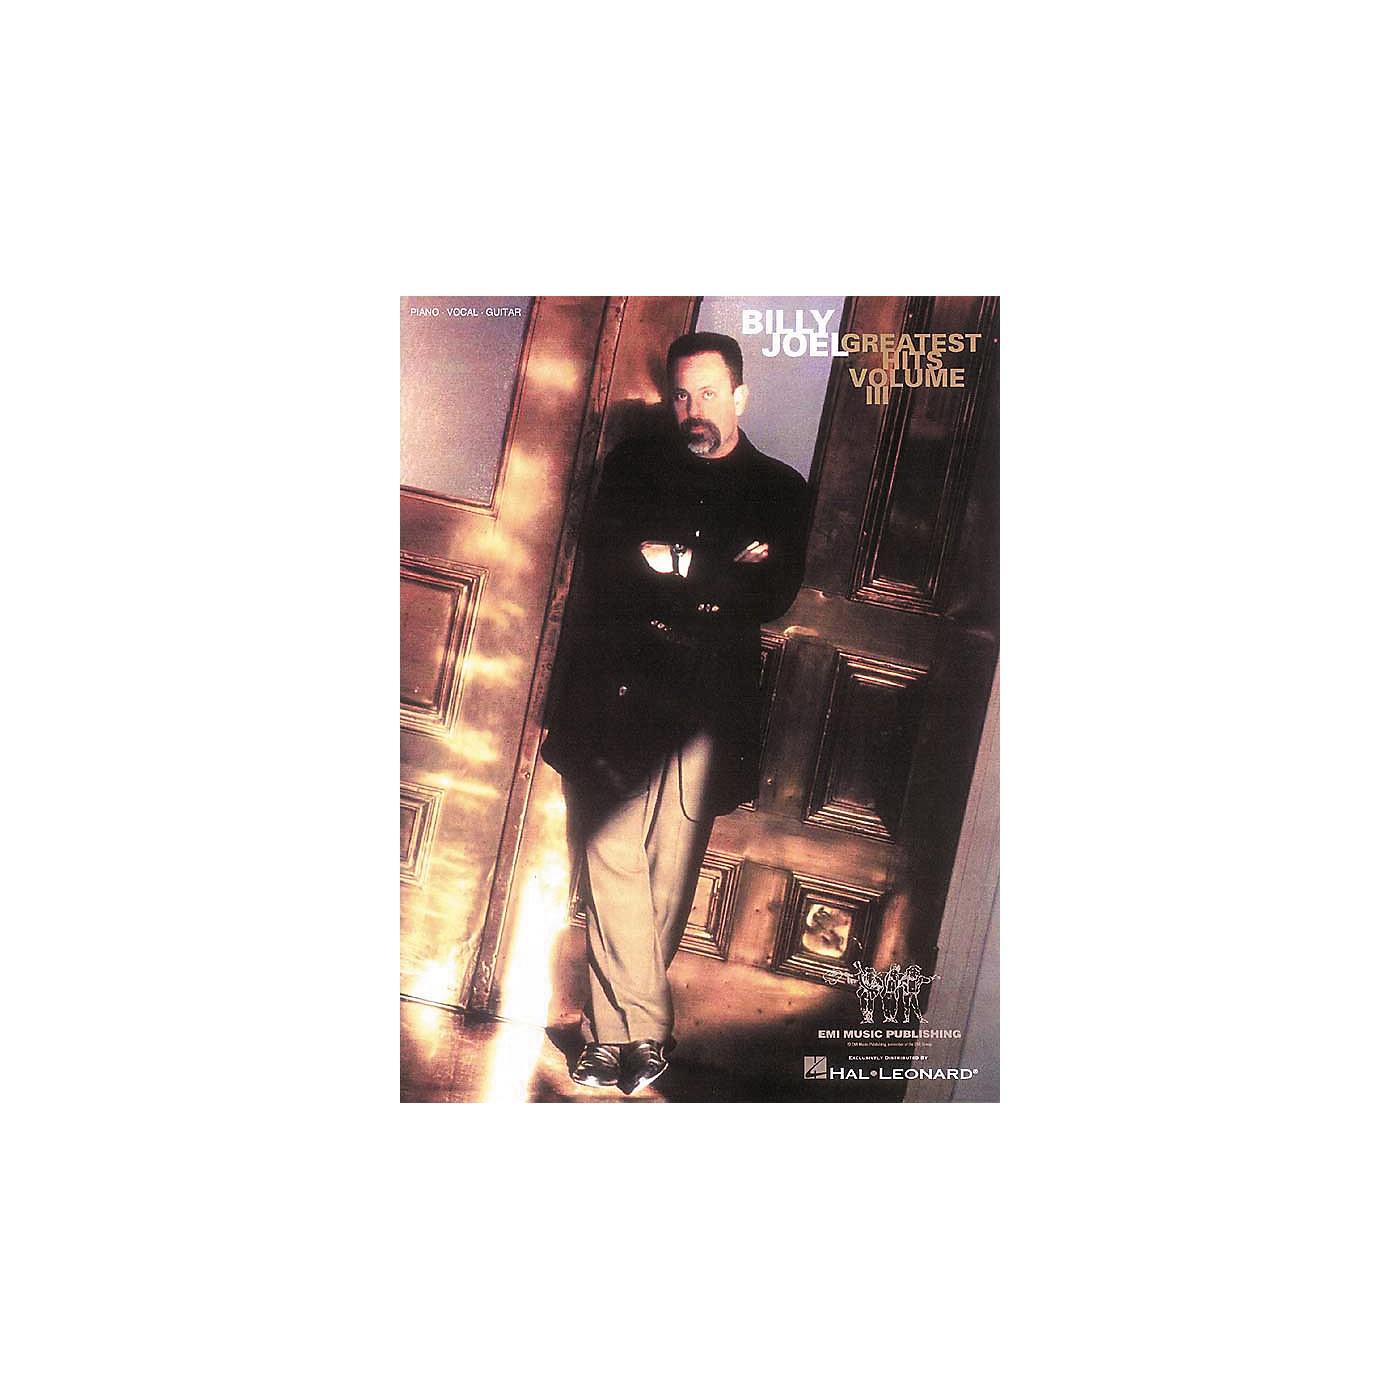 Hal Leonard Billy Joel Greatest Hits Volume 3 Piano, Vocal, Guitar Songbook thumbnail